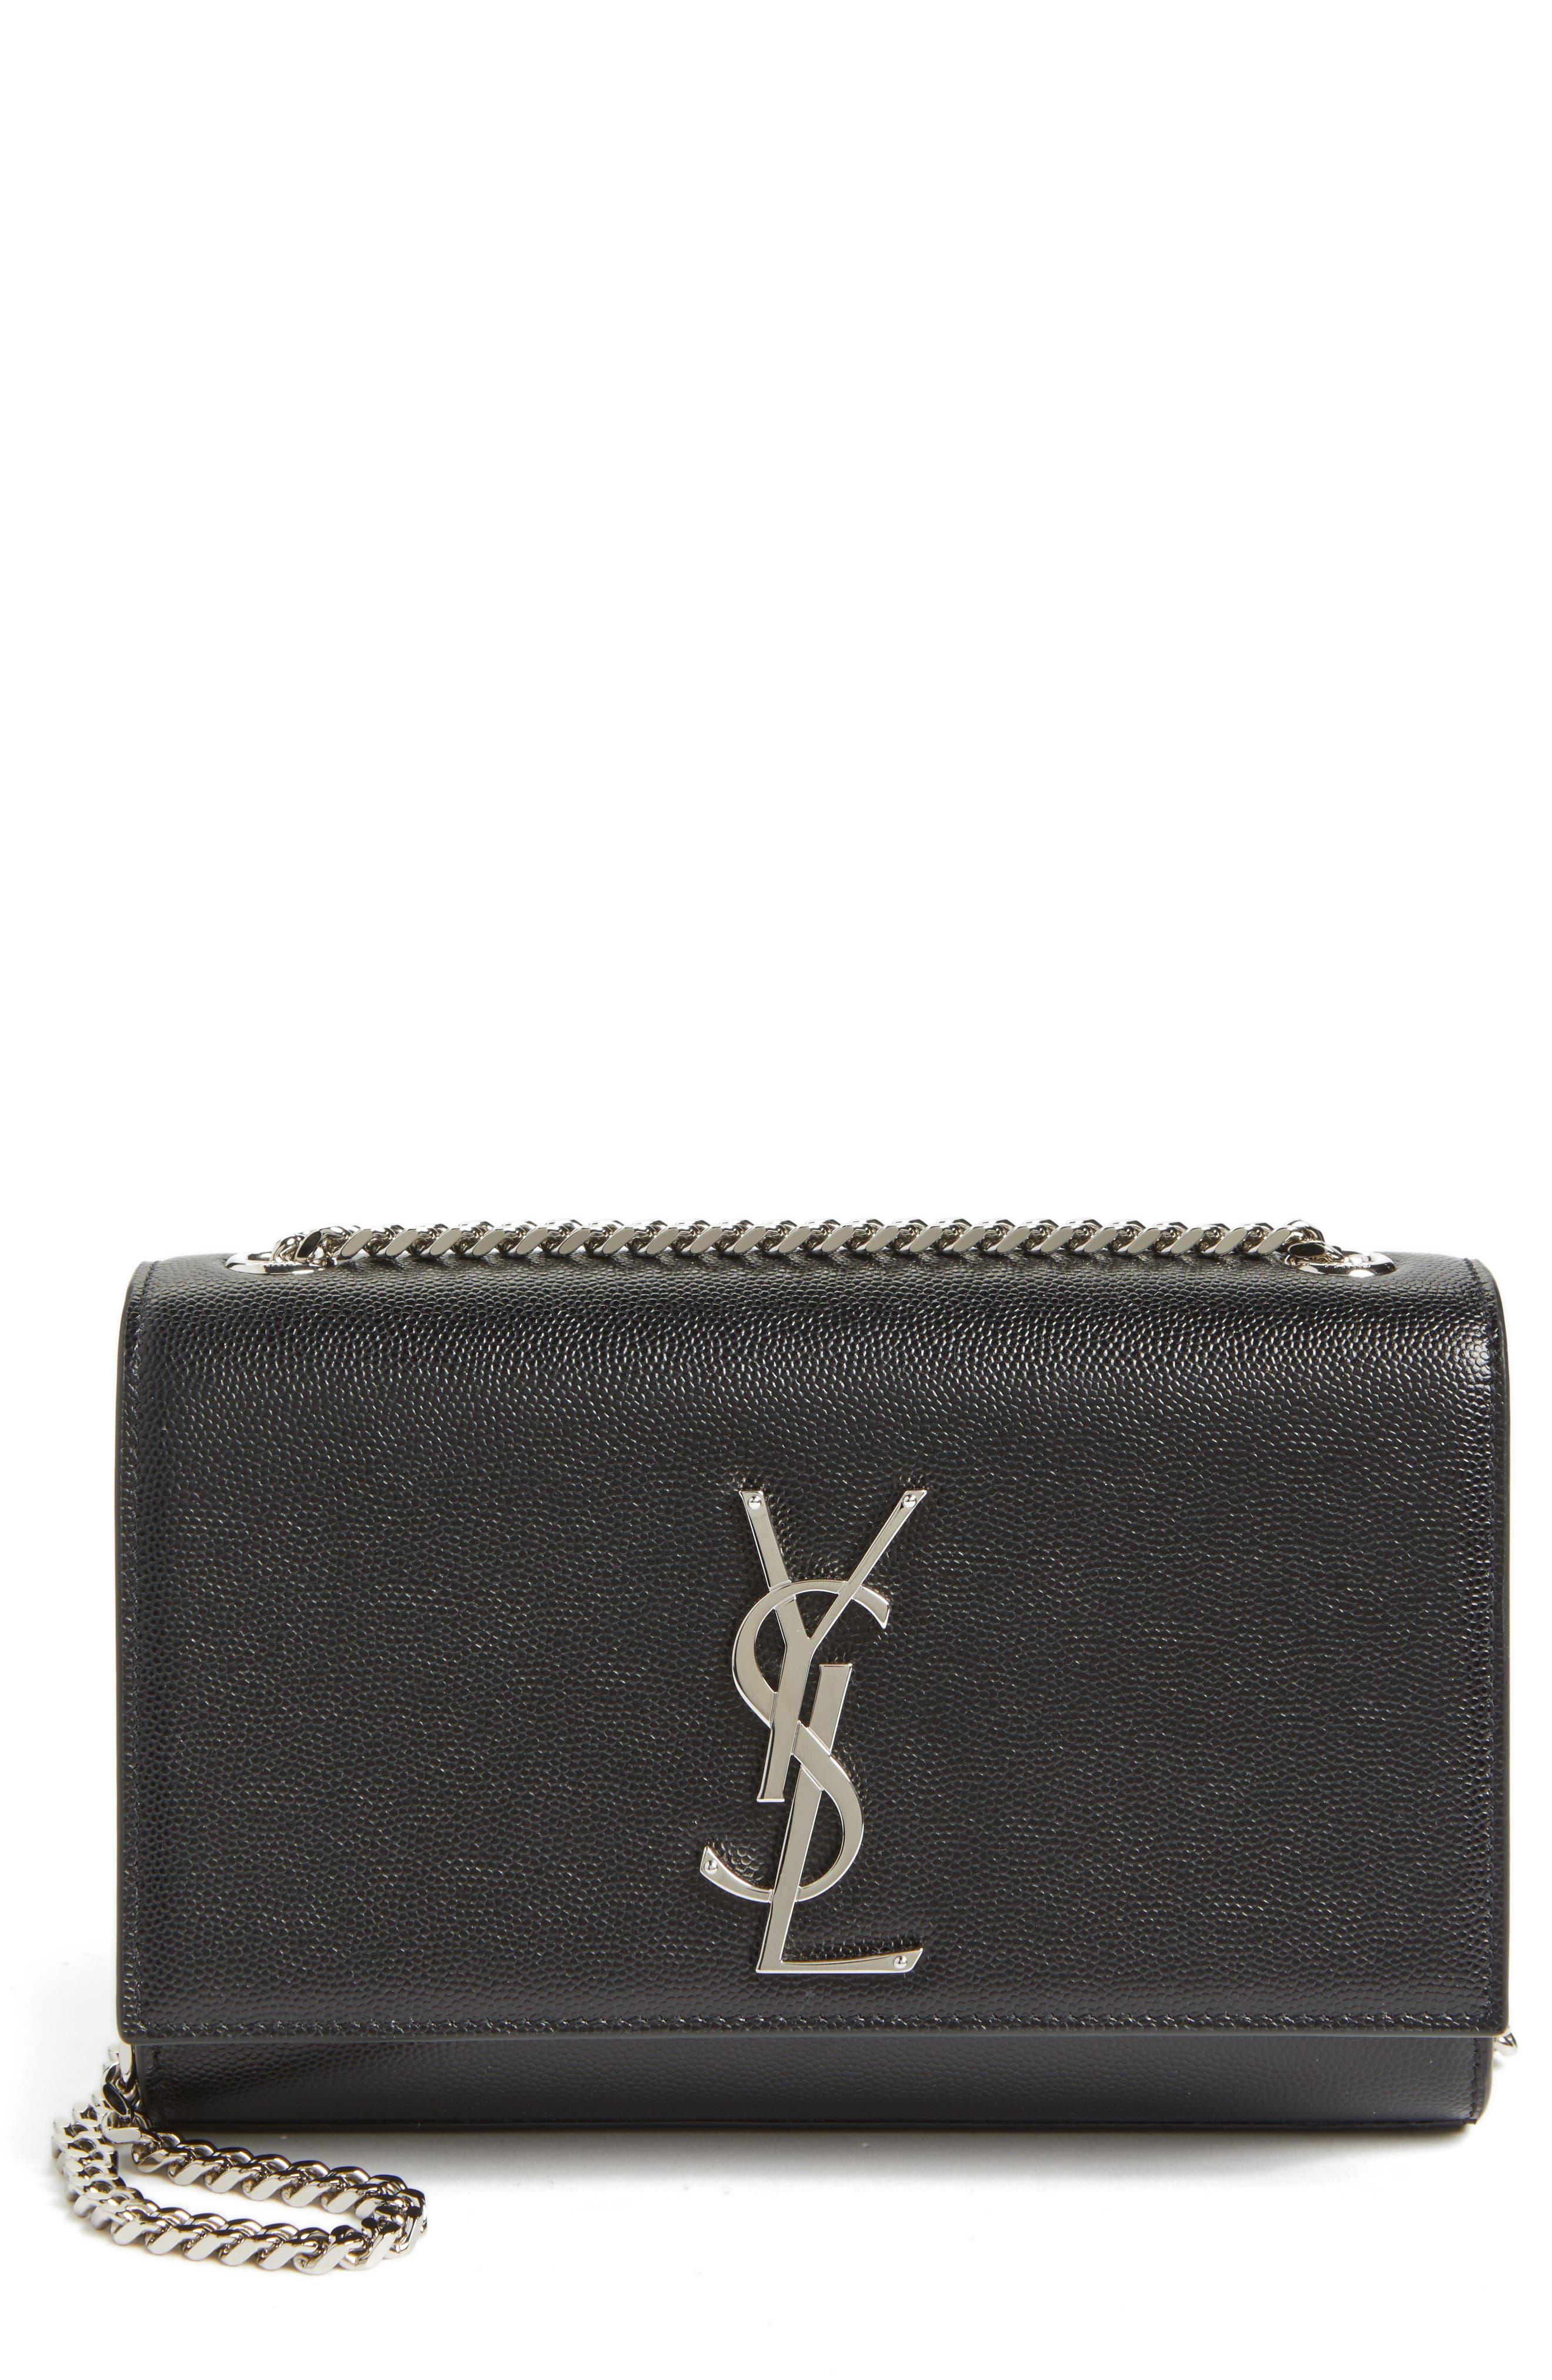 Saint Laurent Small Kate Grained Leather Crossbody Bag | Nordstrom